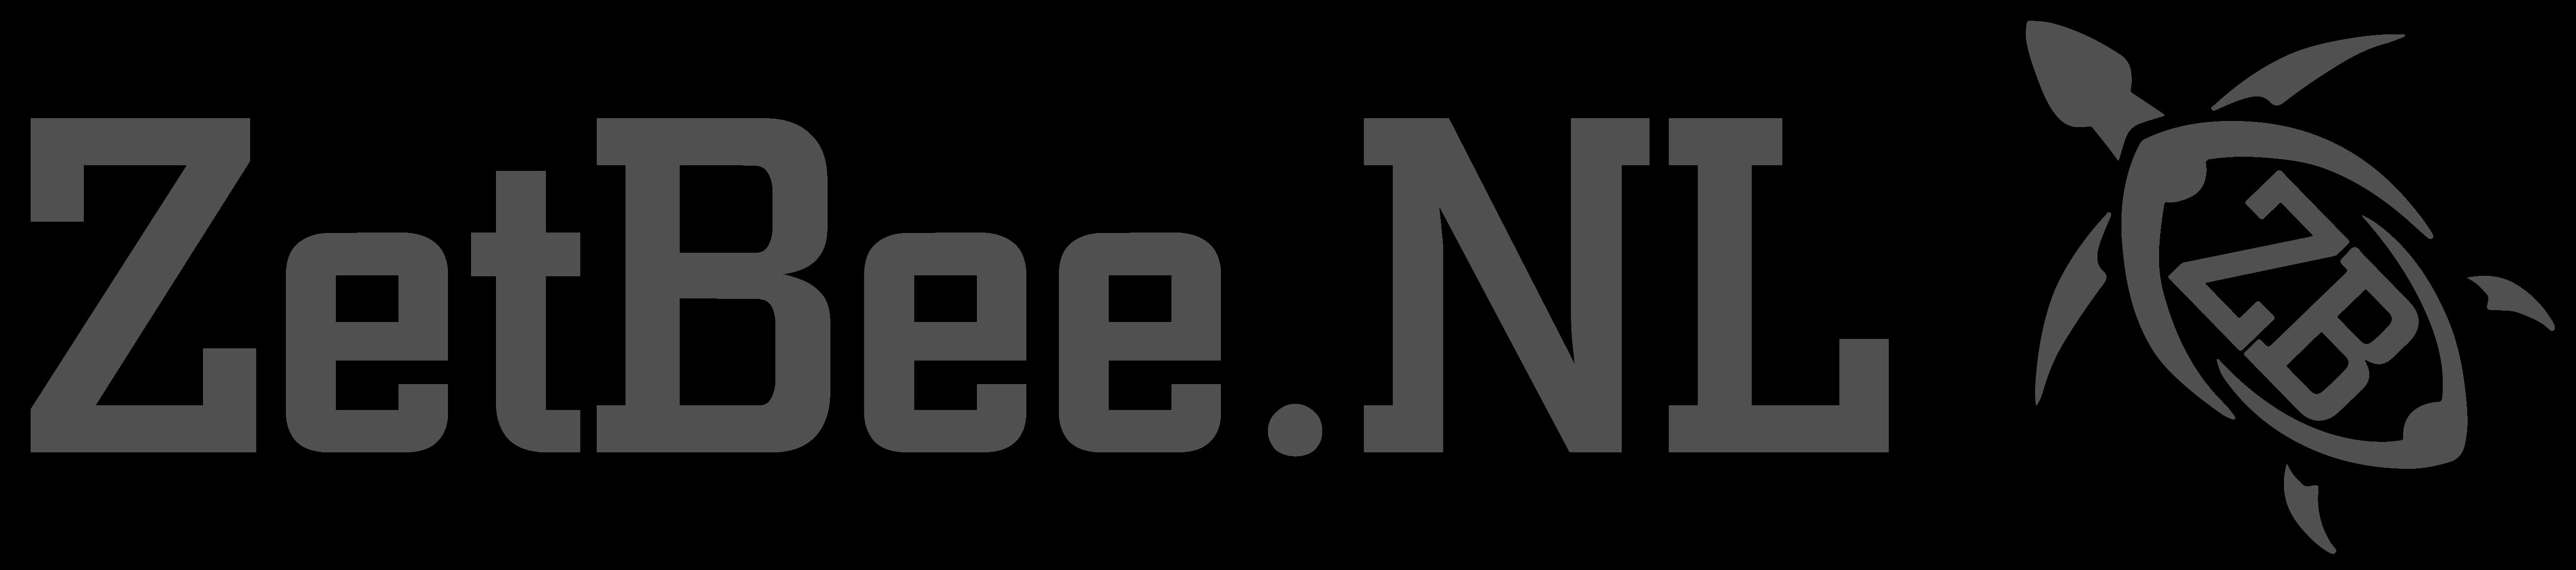 ZetBee.NL